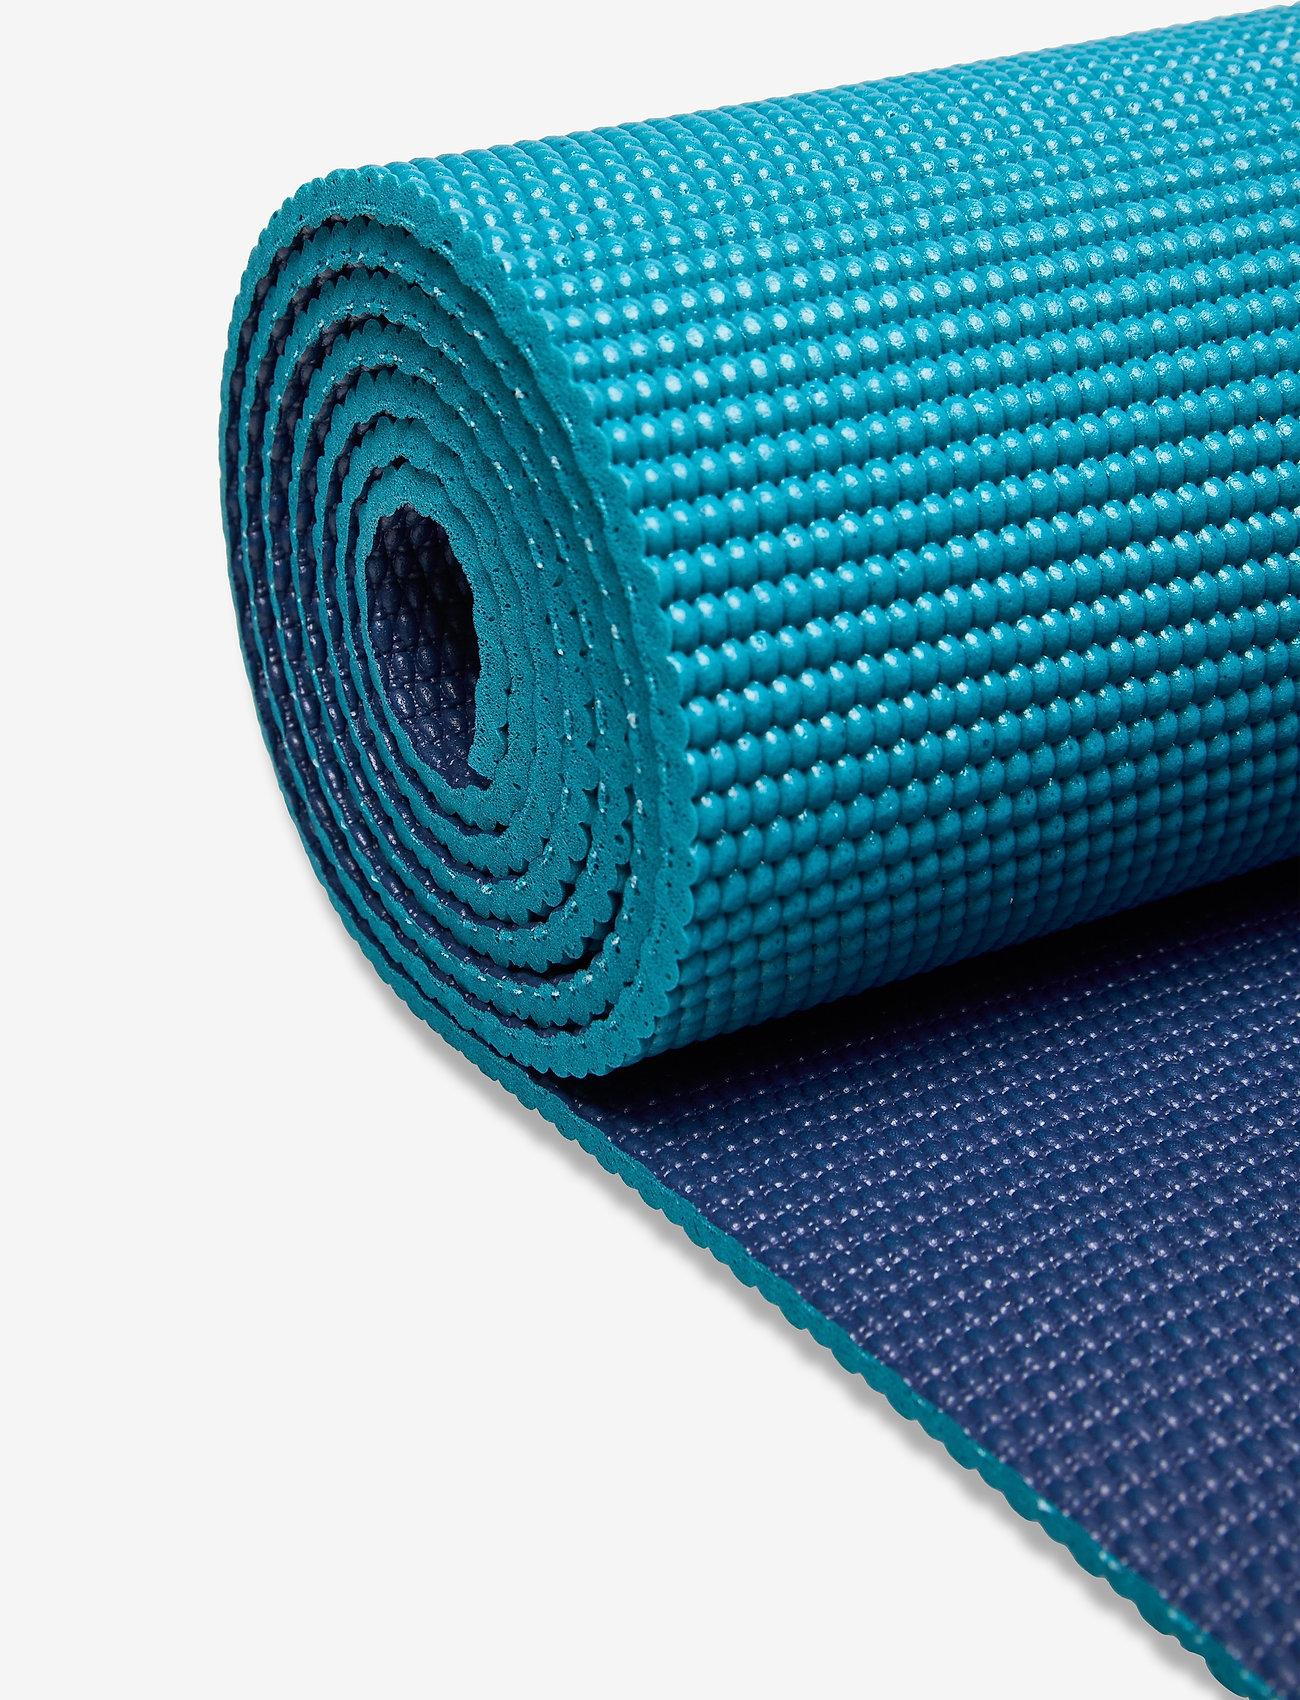 Gaiam - 6mm Yoga Mat 2-Color Navy/Blue - yogamatten & uitrusting - navy/blue - 1